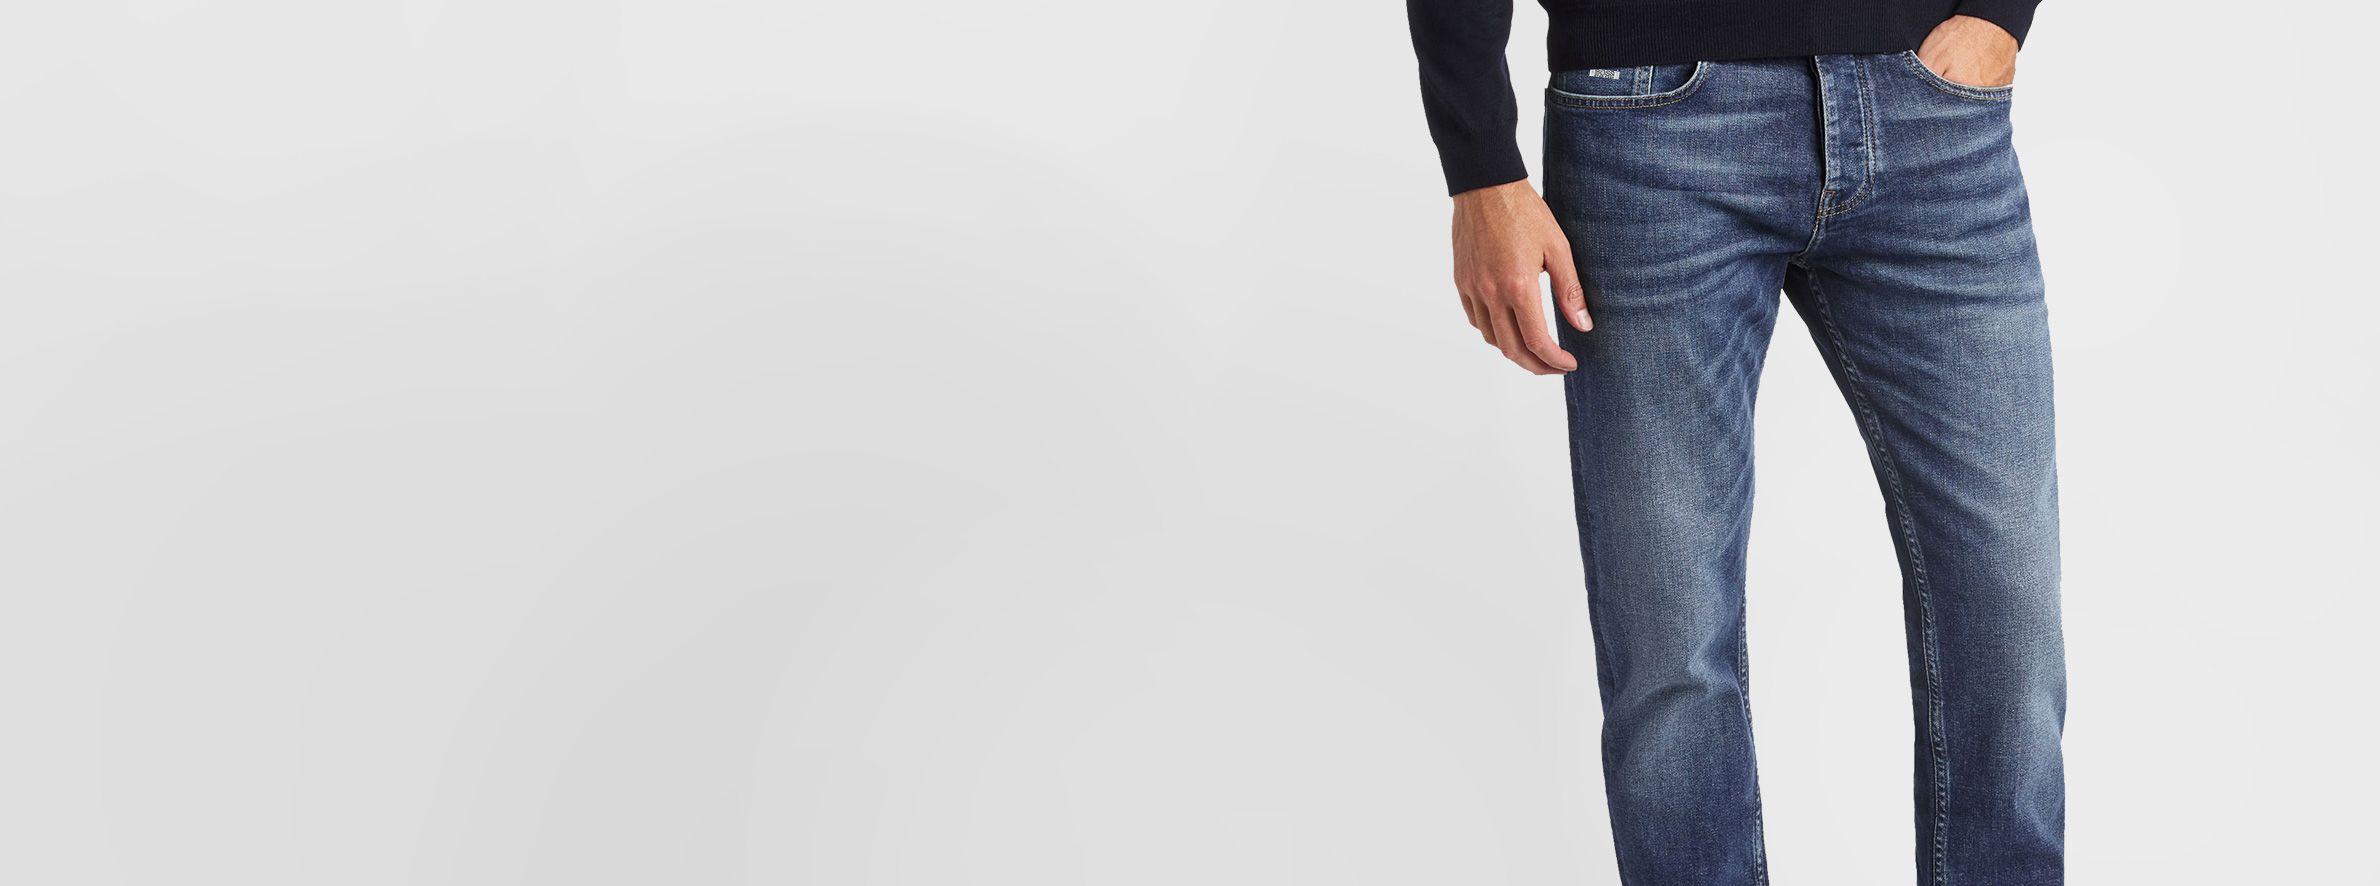 Men s Jeans   Diesel, Levi s, Armani, Pepe   John Lewis 3affc238ed